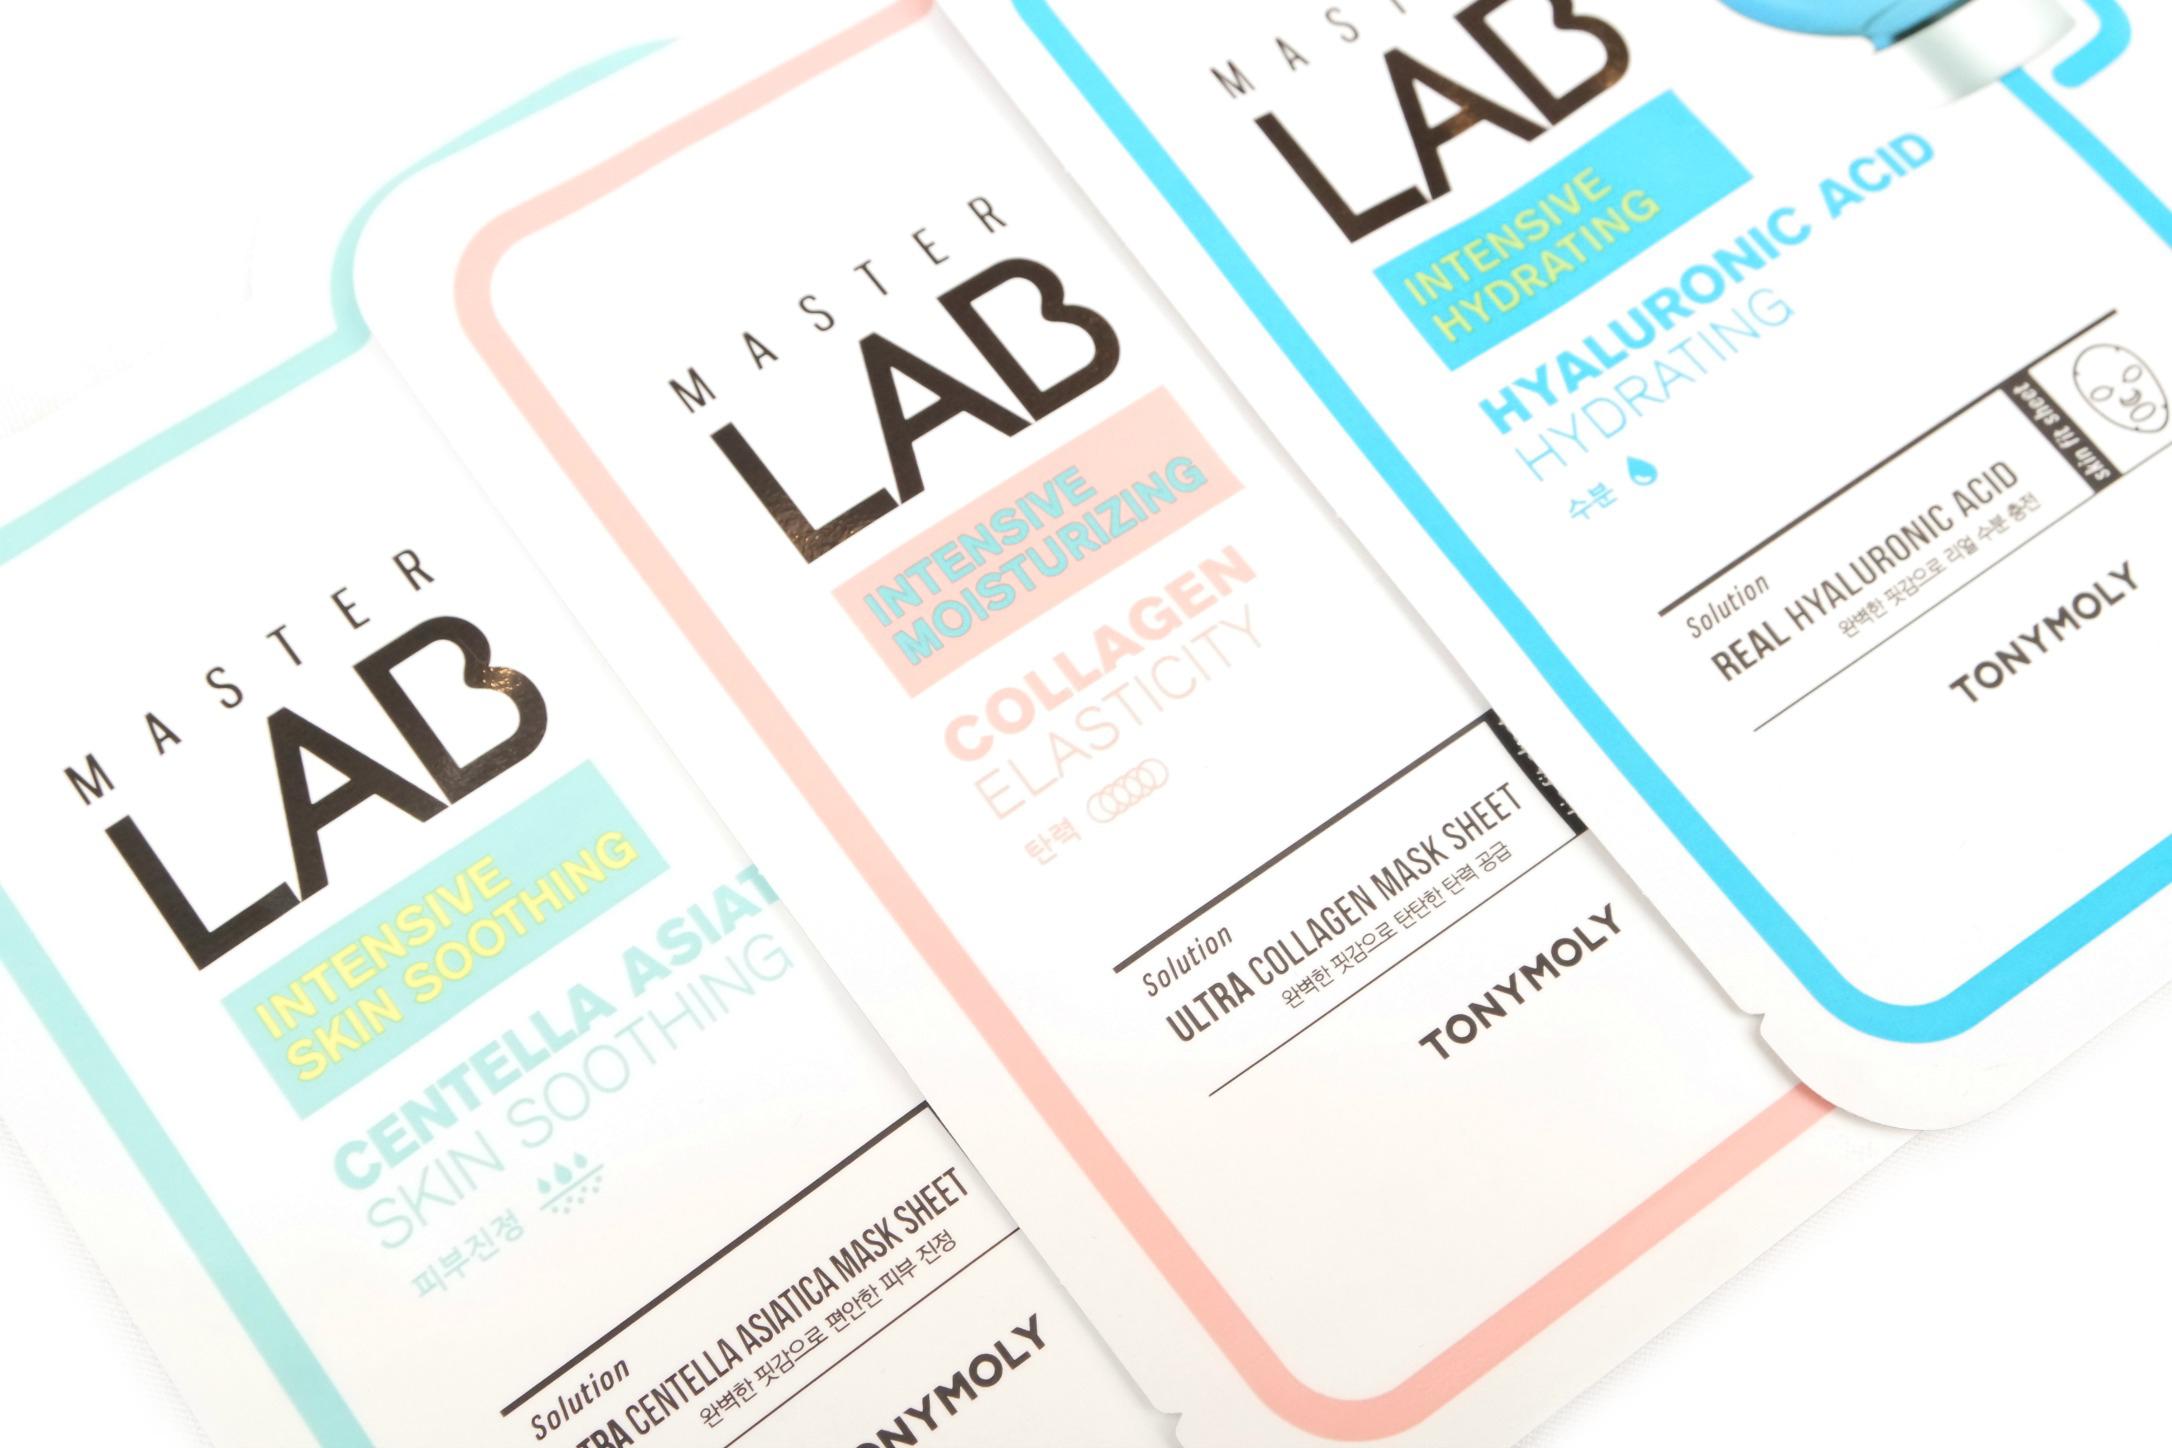 Tonymoly Master Lab Sheet Masks Review The Beautynerd